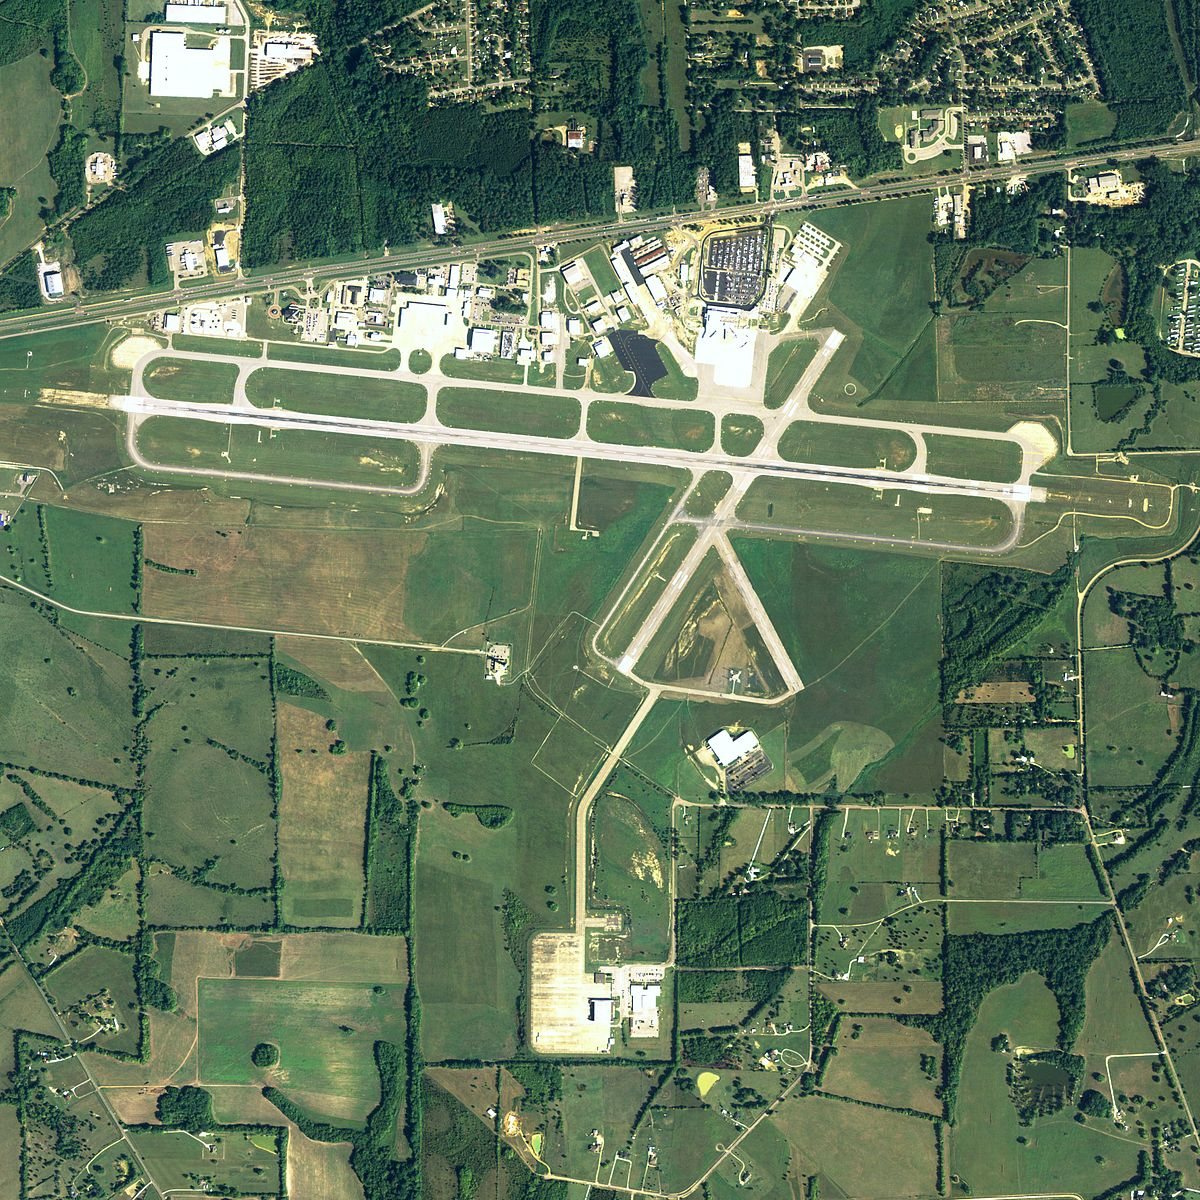 Montgomery Regional Airport Wikipedia - Us regional airport map